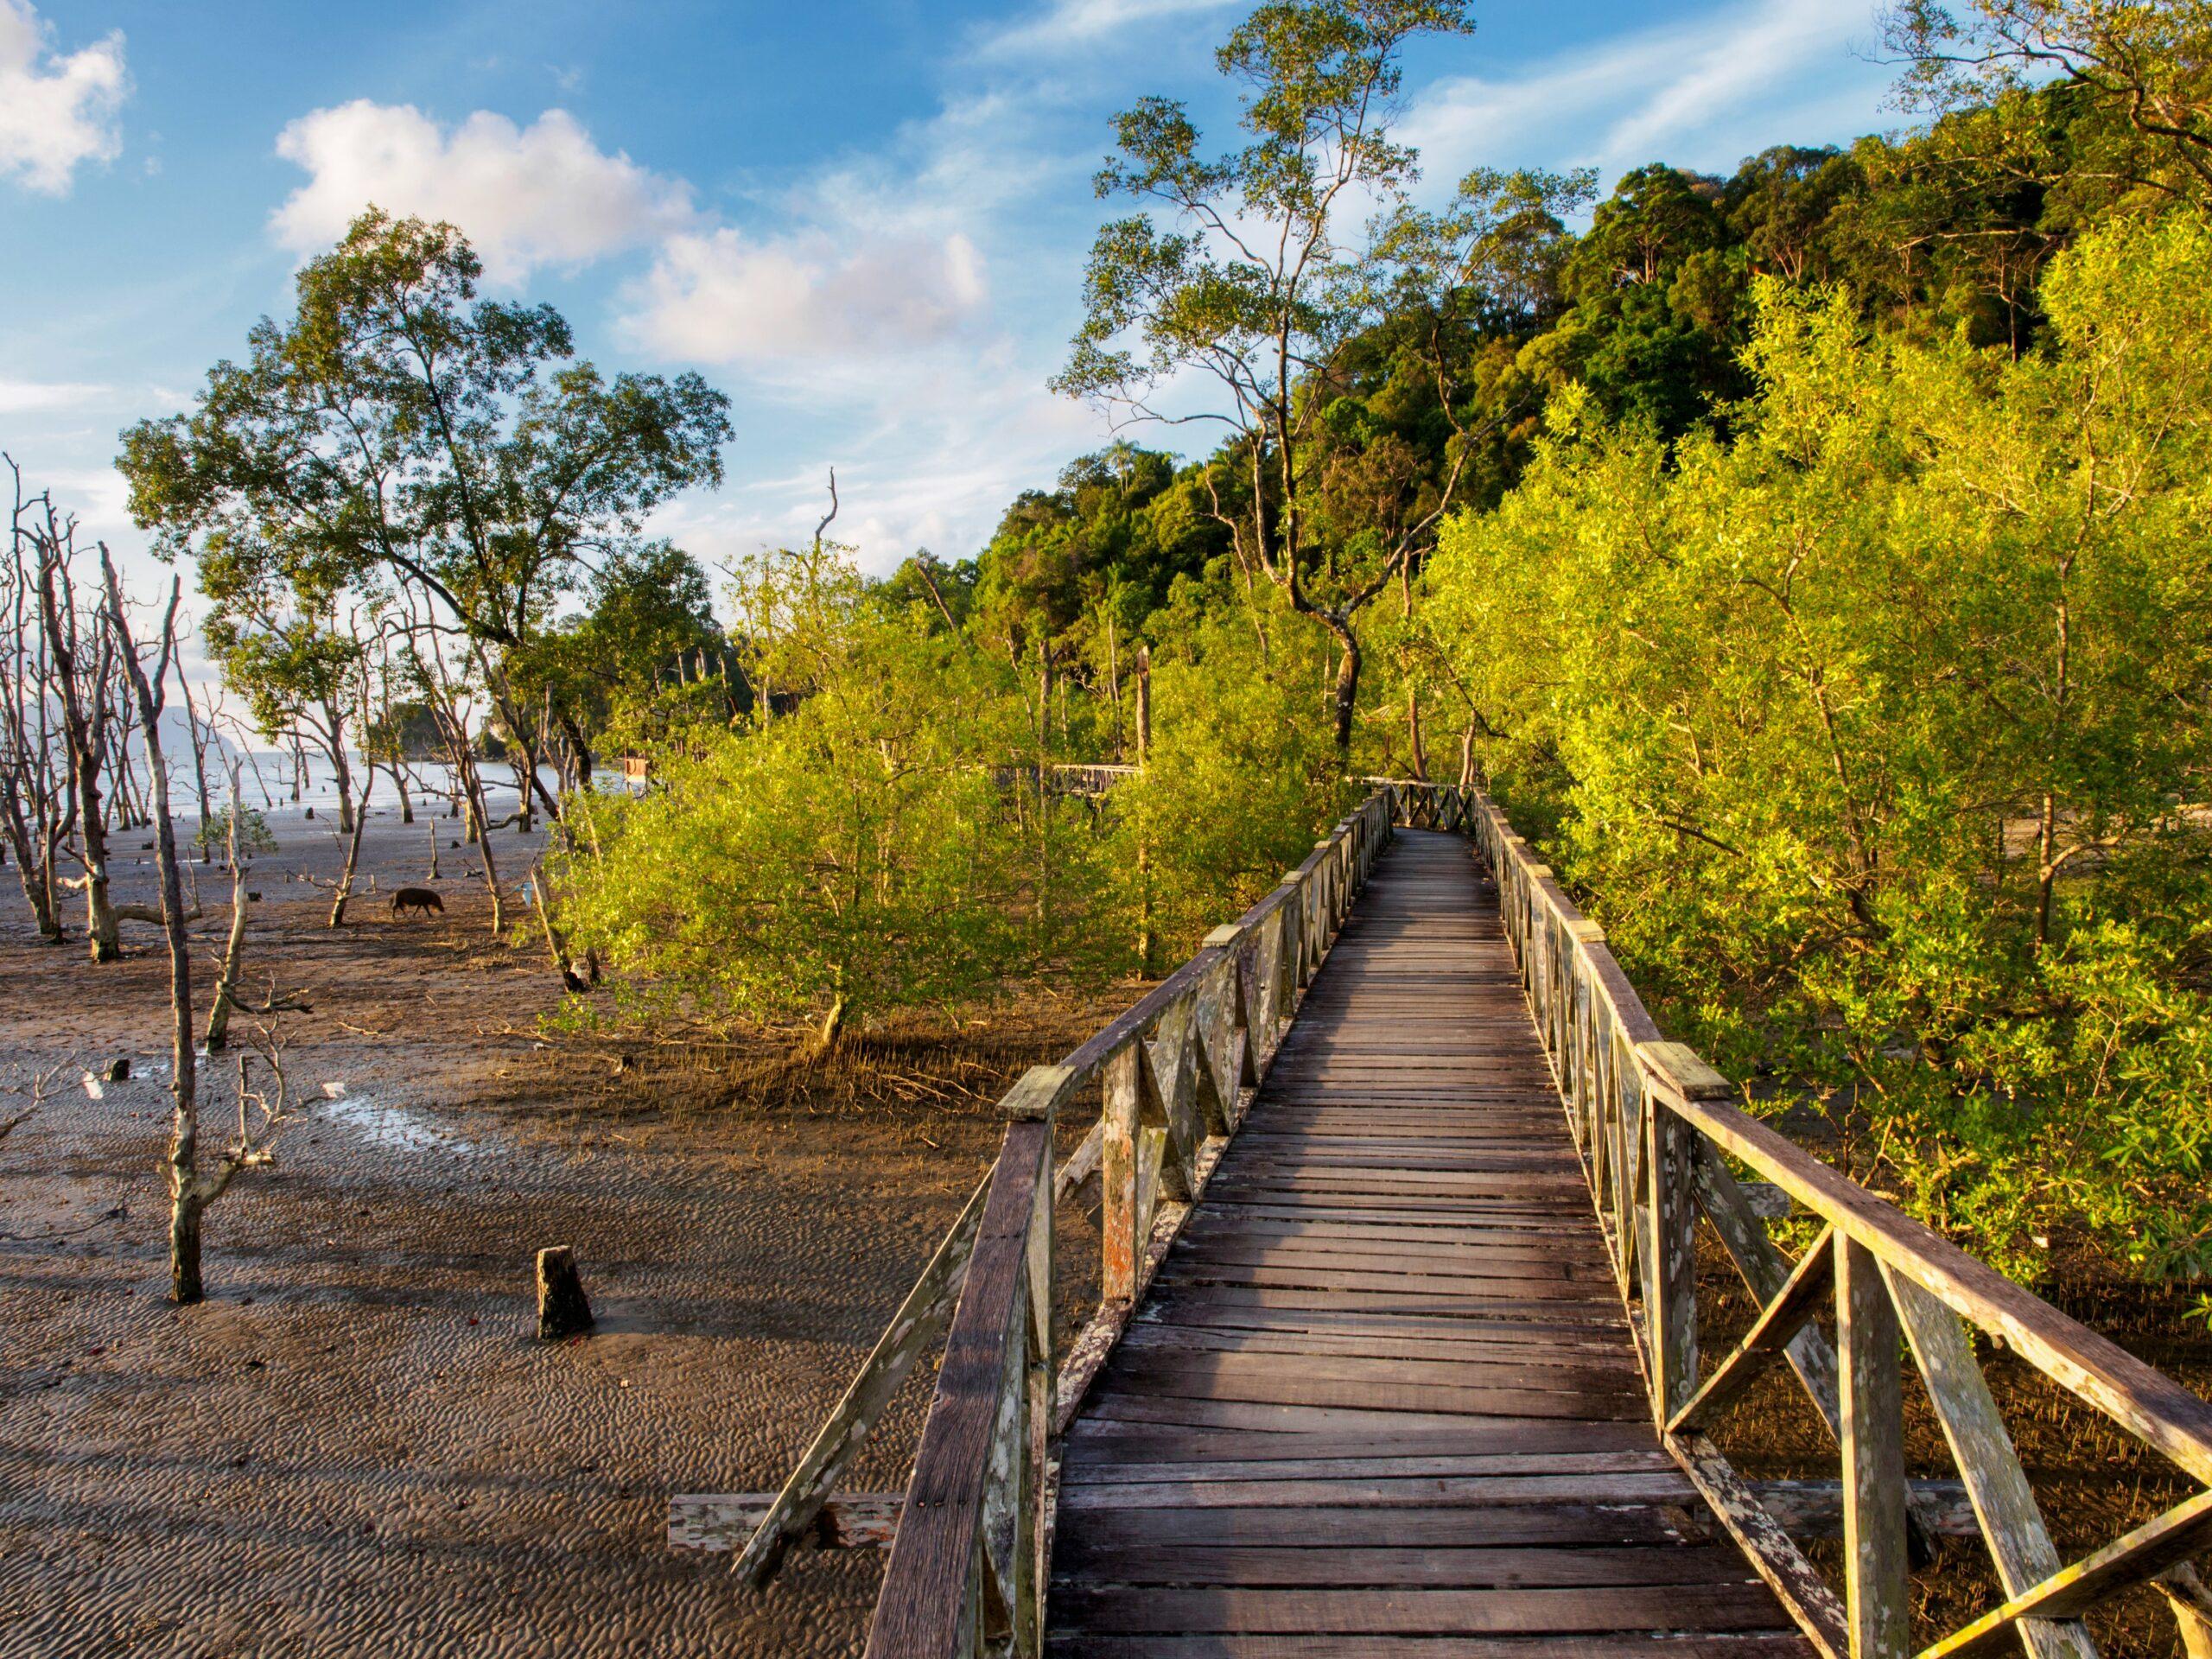 Bako national park, Borneo, Malaysia